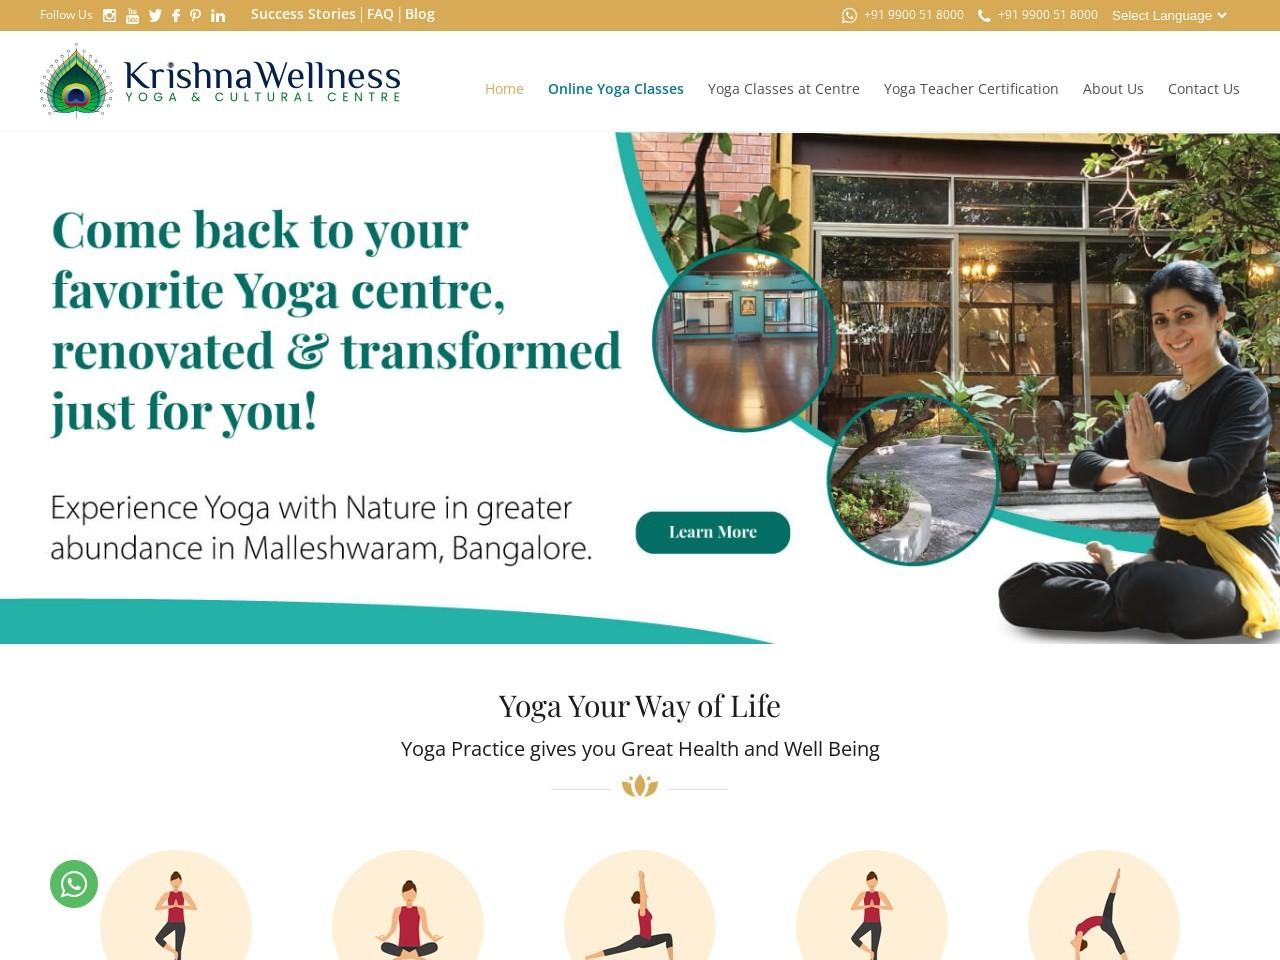 Sri Krishna Wellness centre, Yoga centre